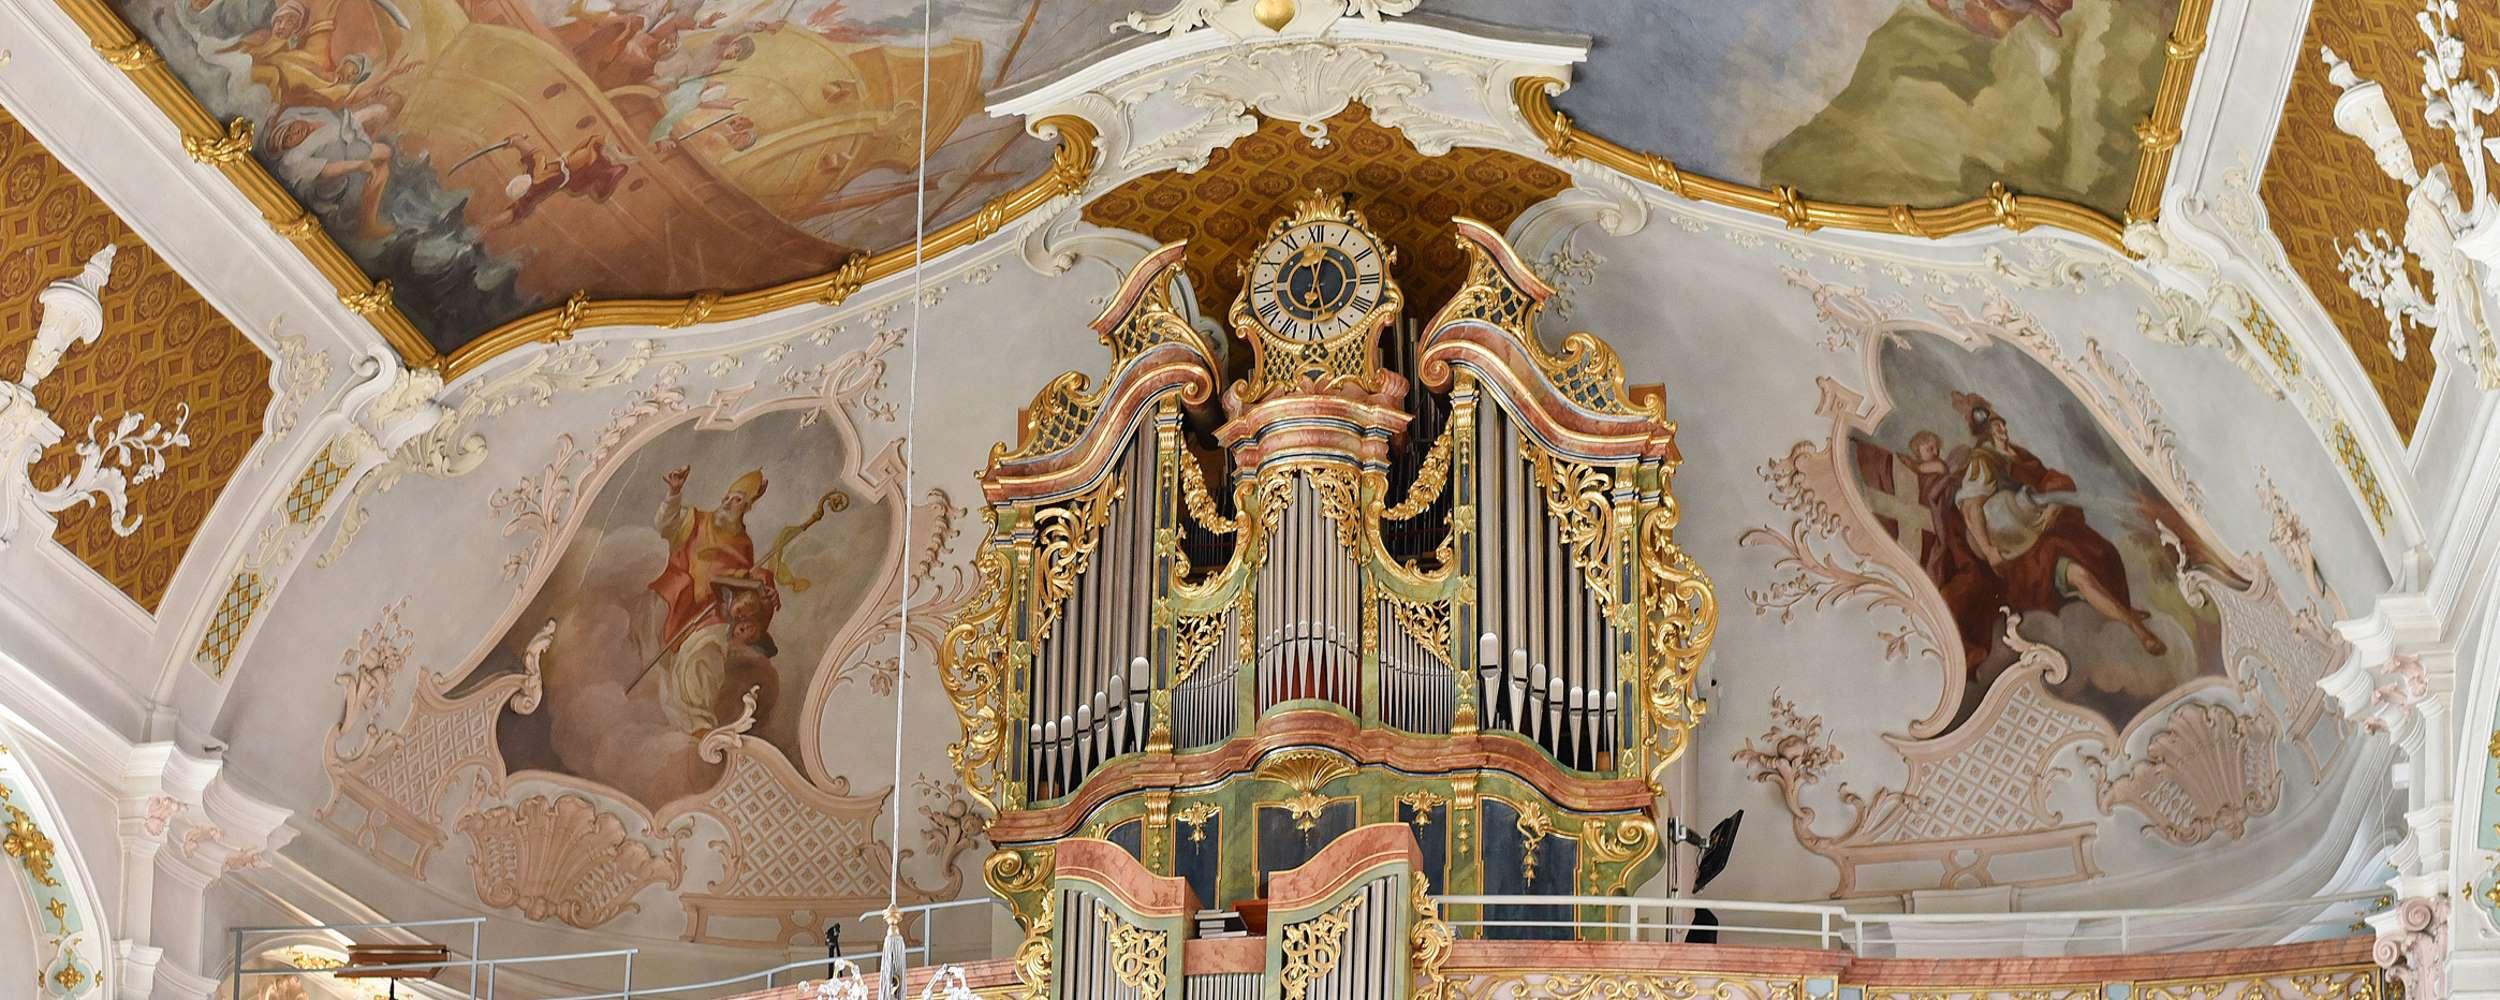 Orgel Prien_kl.jpg_2500x1000